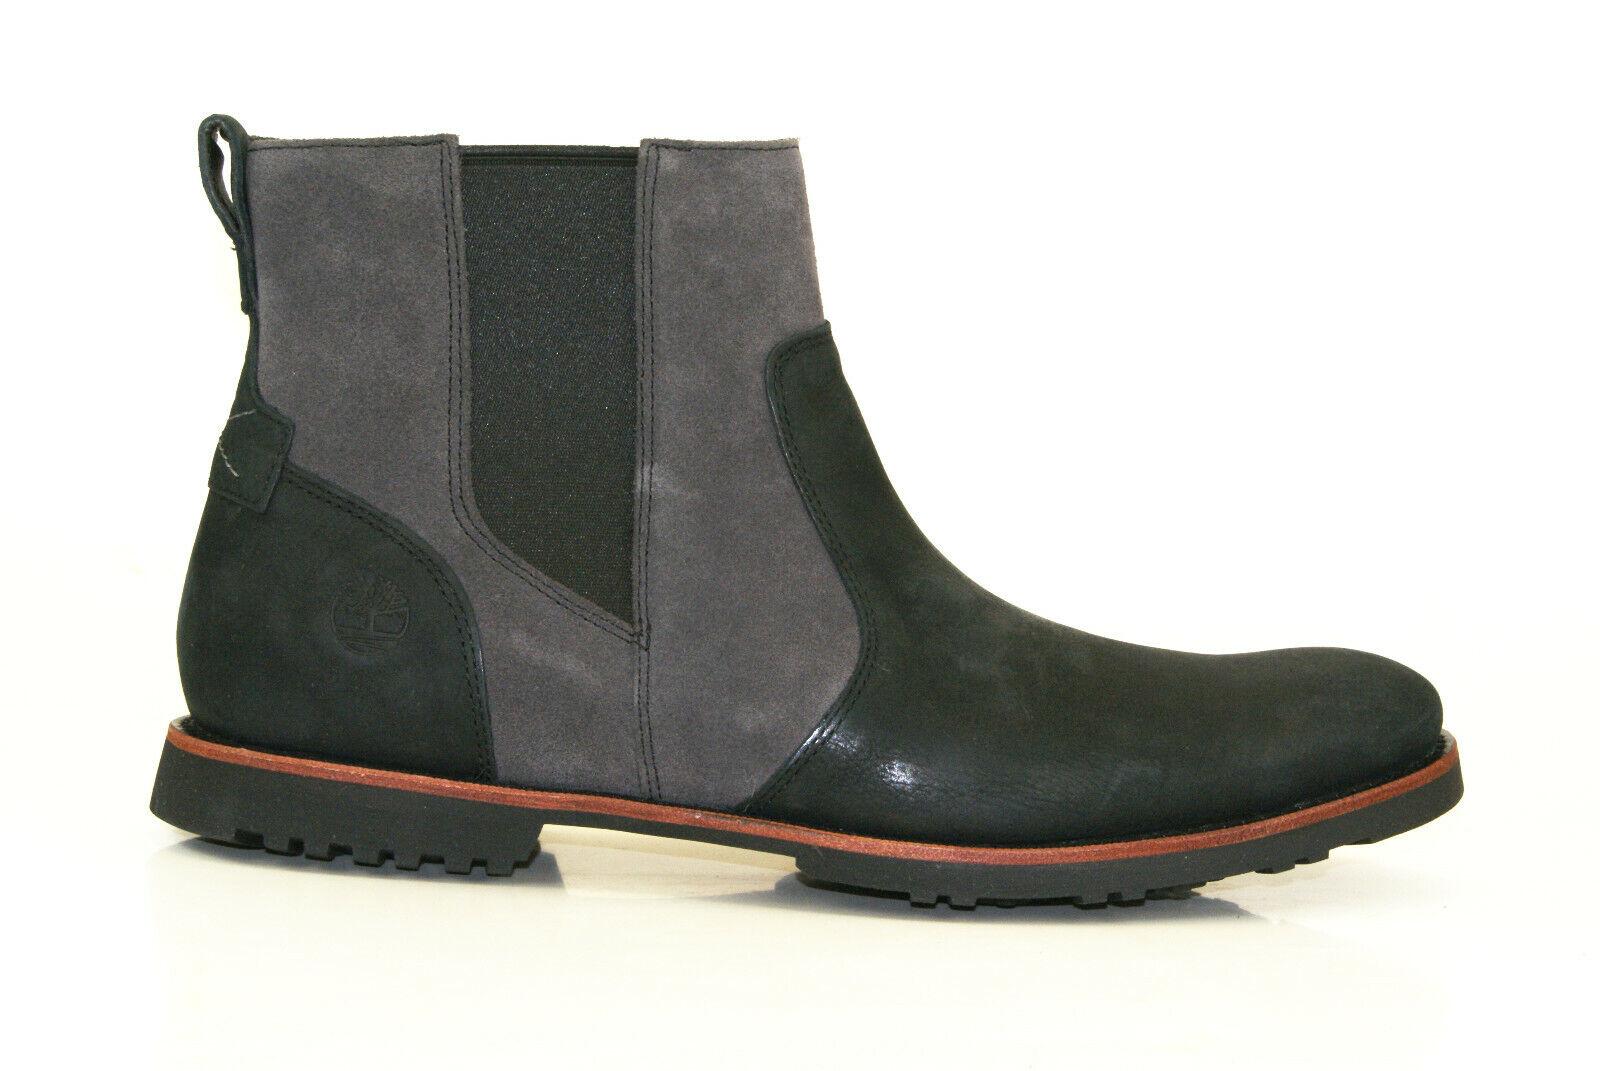 Timberland Kendrick Chelsea Side Zip Stiefel Stiefeletten Herren Schuhe A1JZT      Sonderpreis